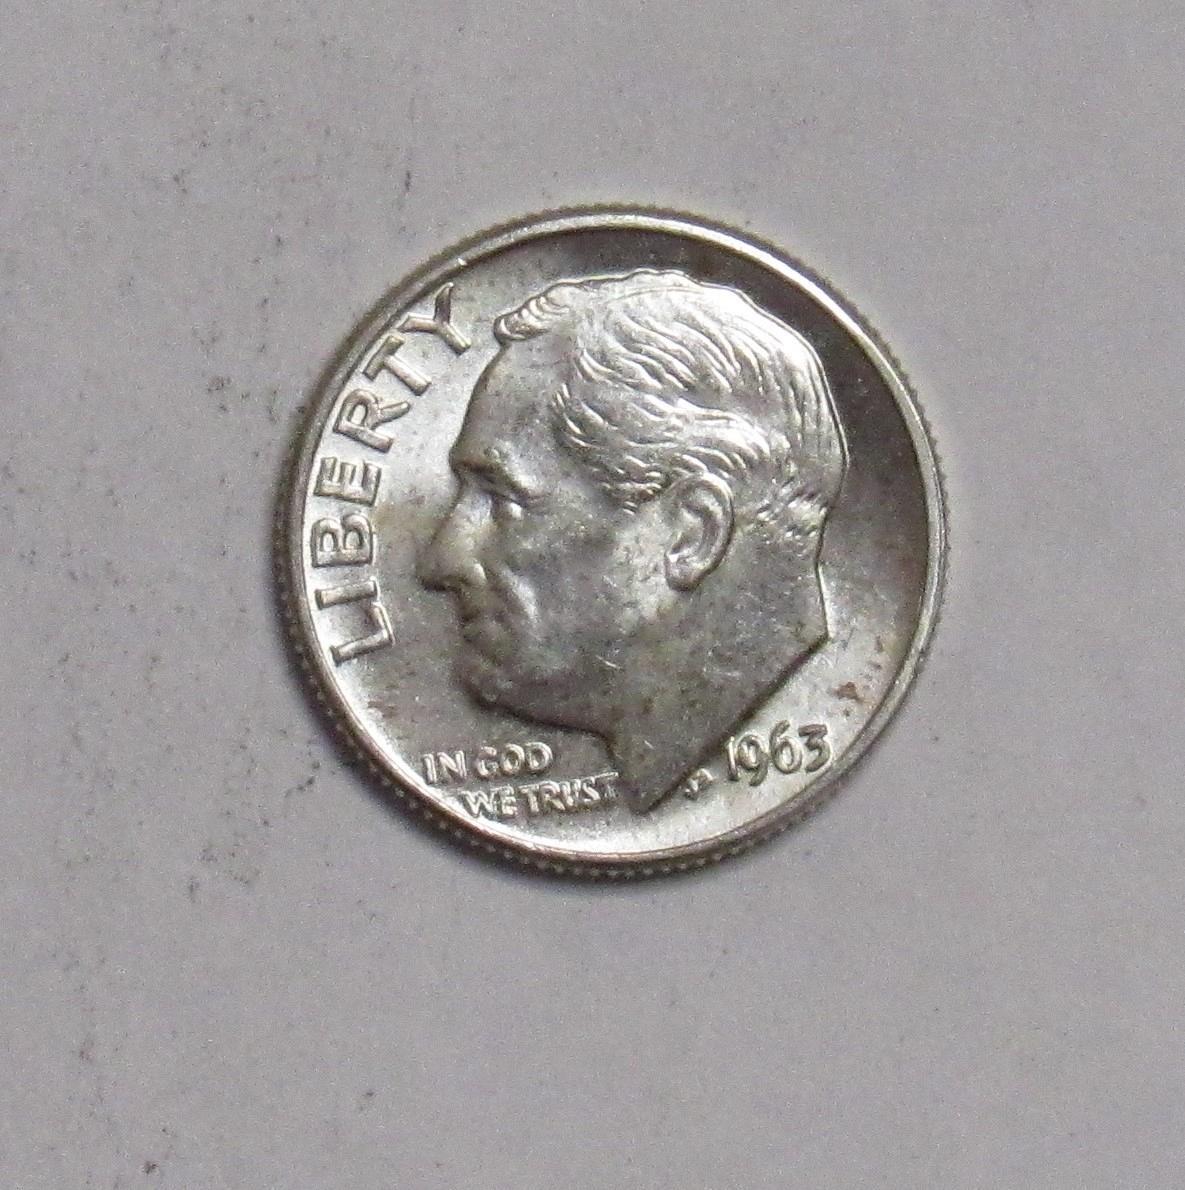 1963  Roosevelt Dime BU uncirculated gem!